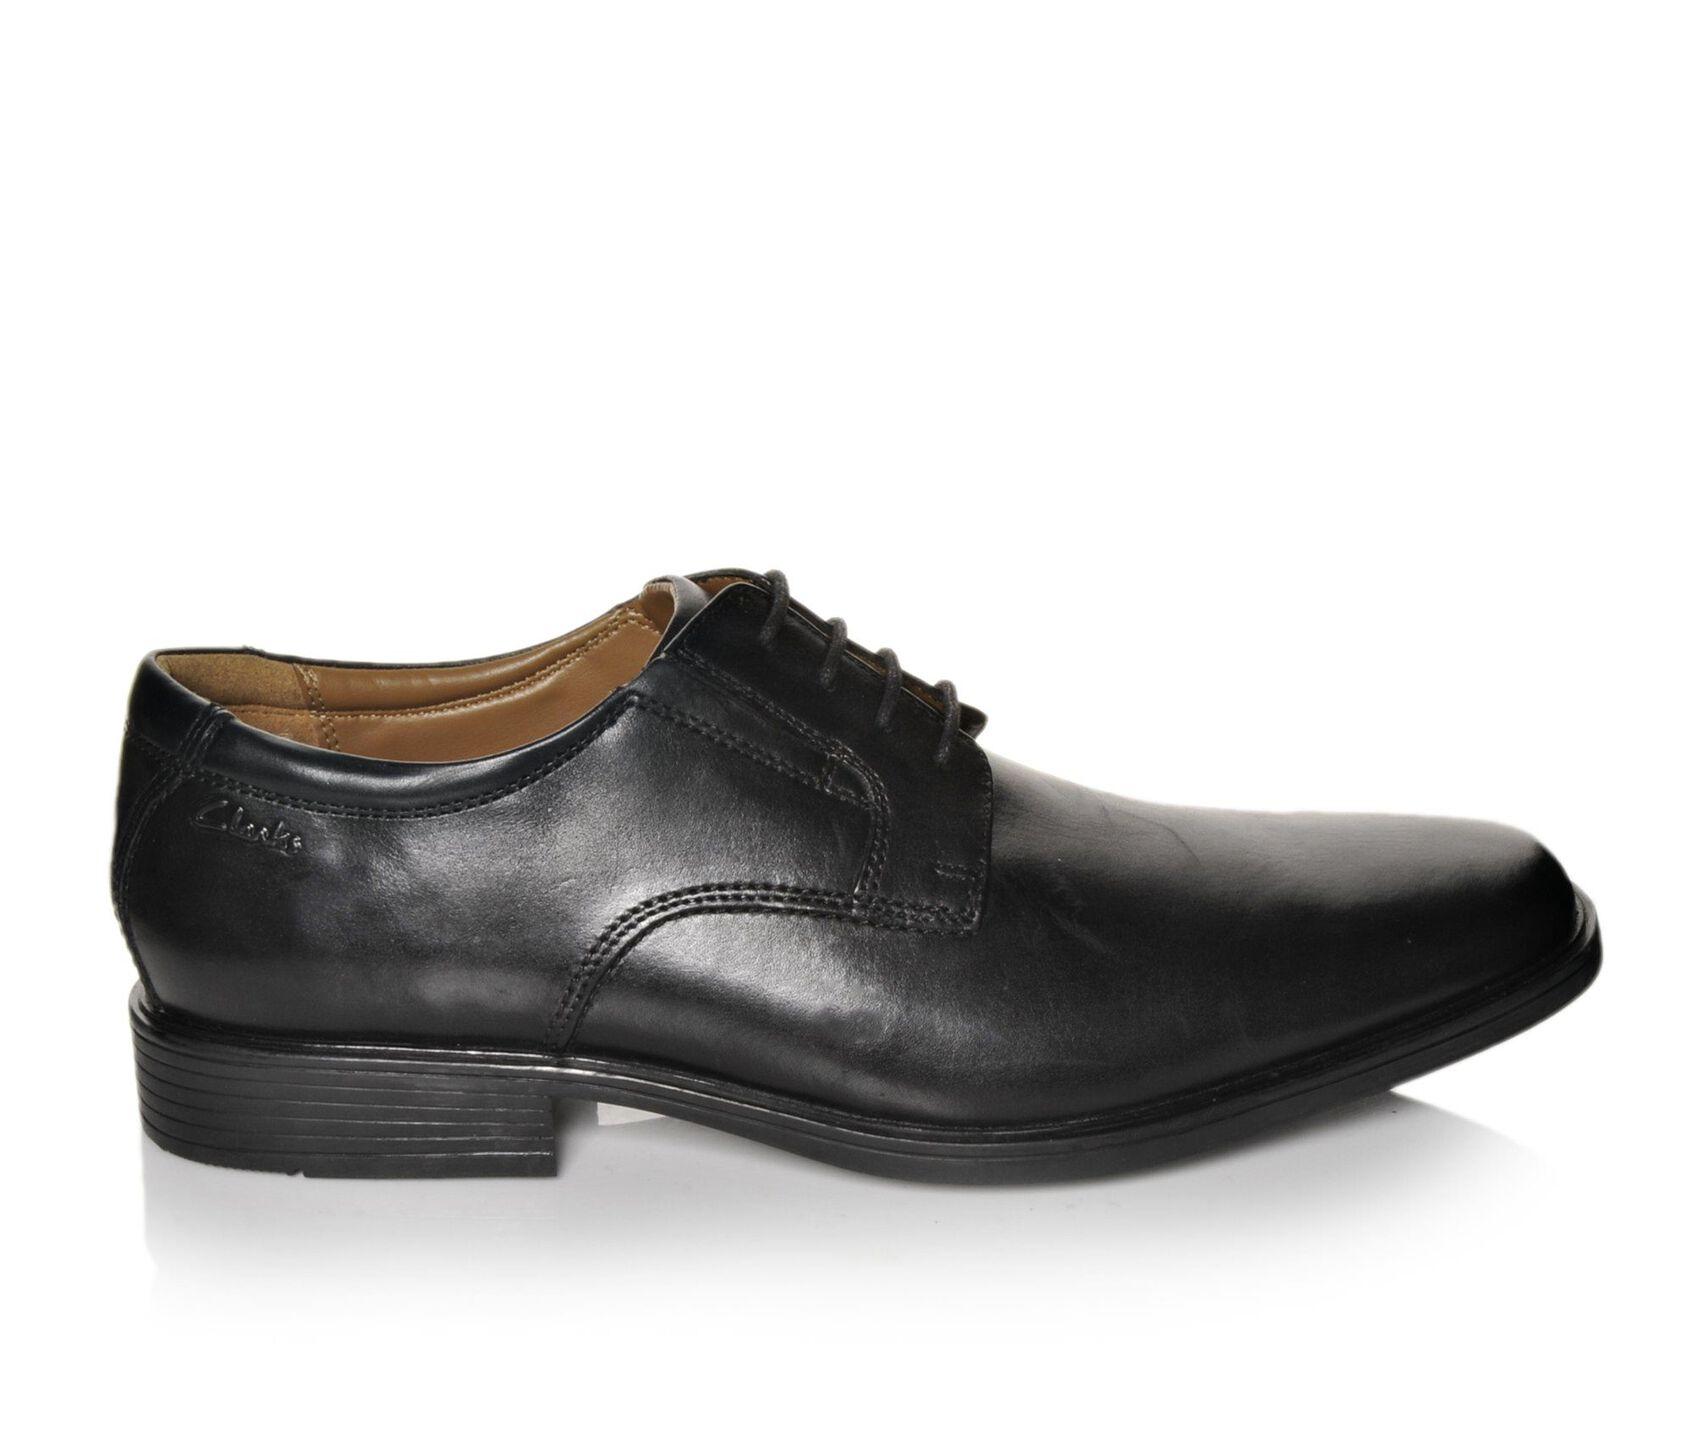 16bd53c441f2a Men's Clarks Tilden Walk Dress Shoes | Shoe Carnival